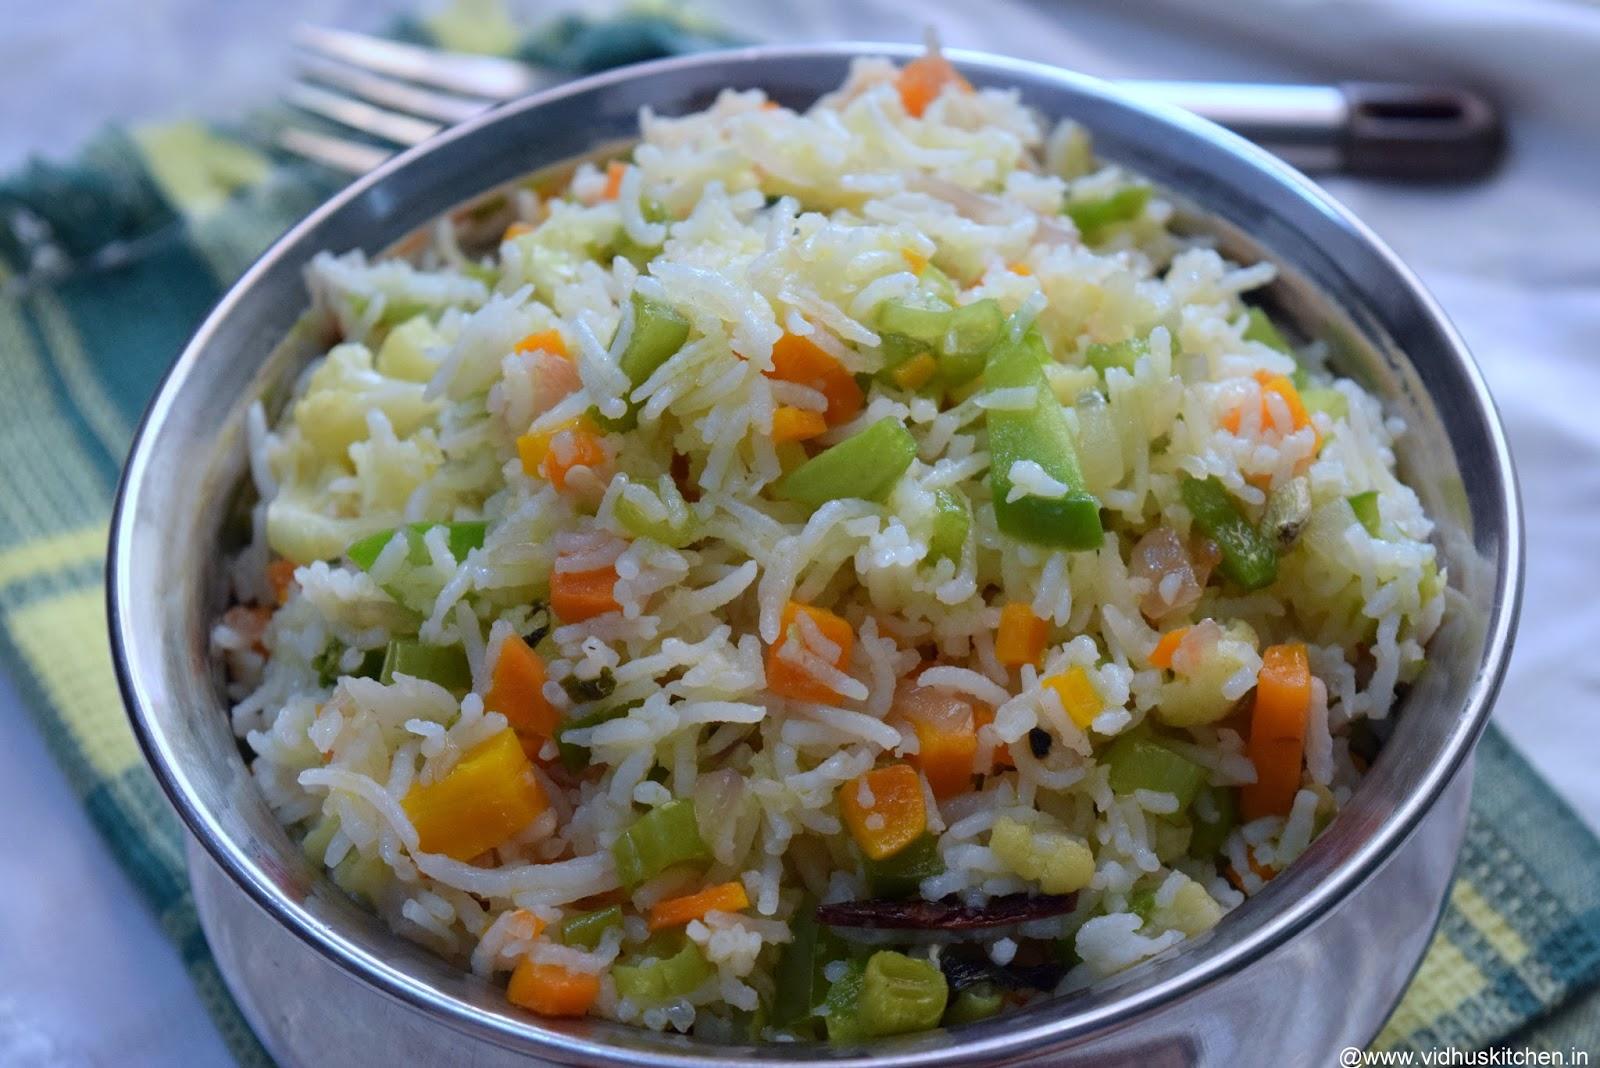 Vidhu's kitchen: Easy & Quick Vegetable pulao